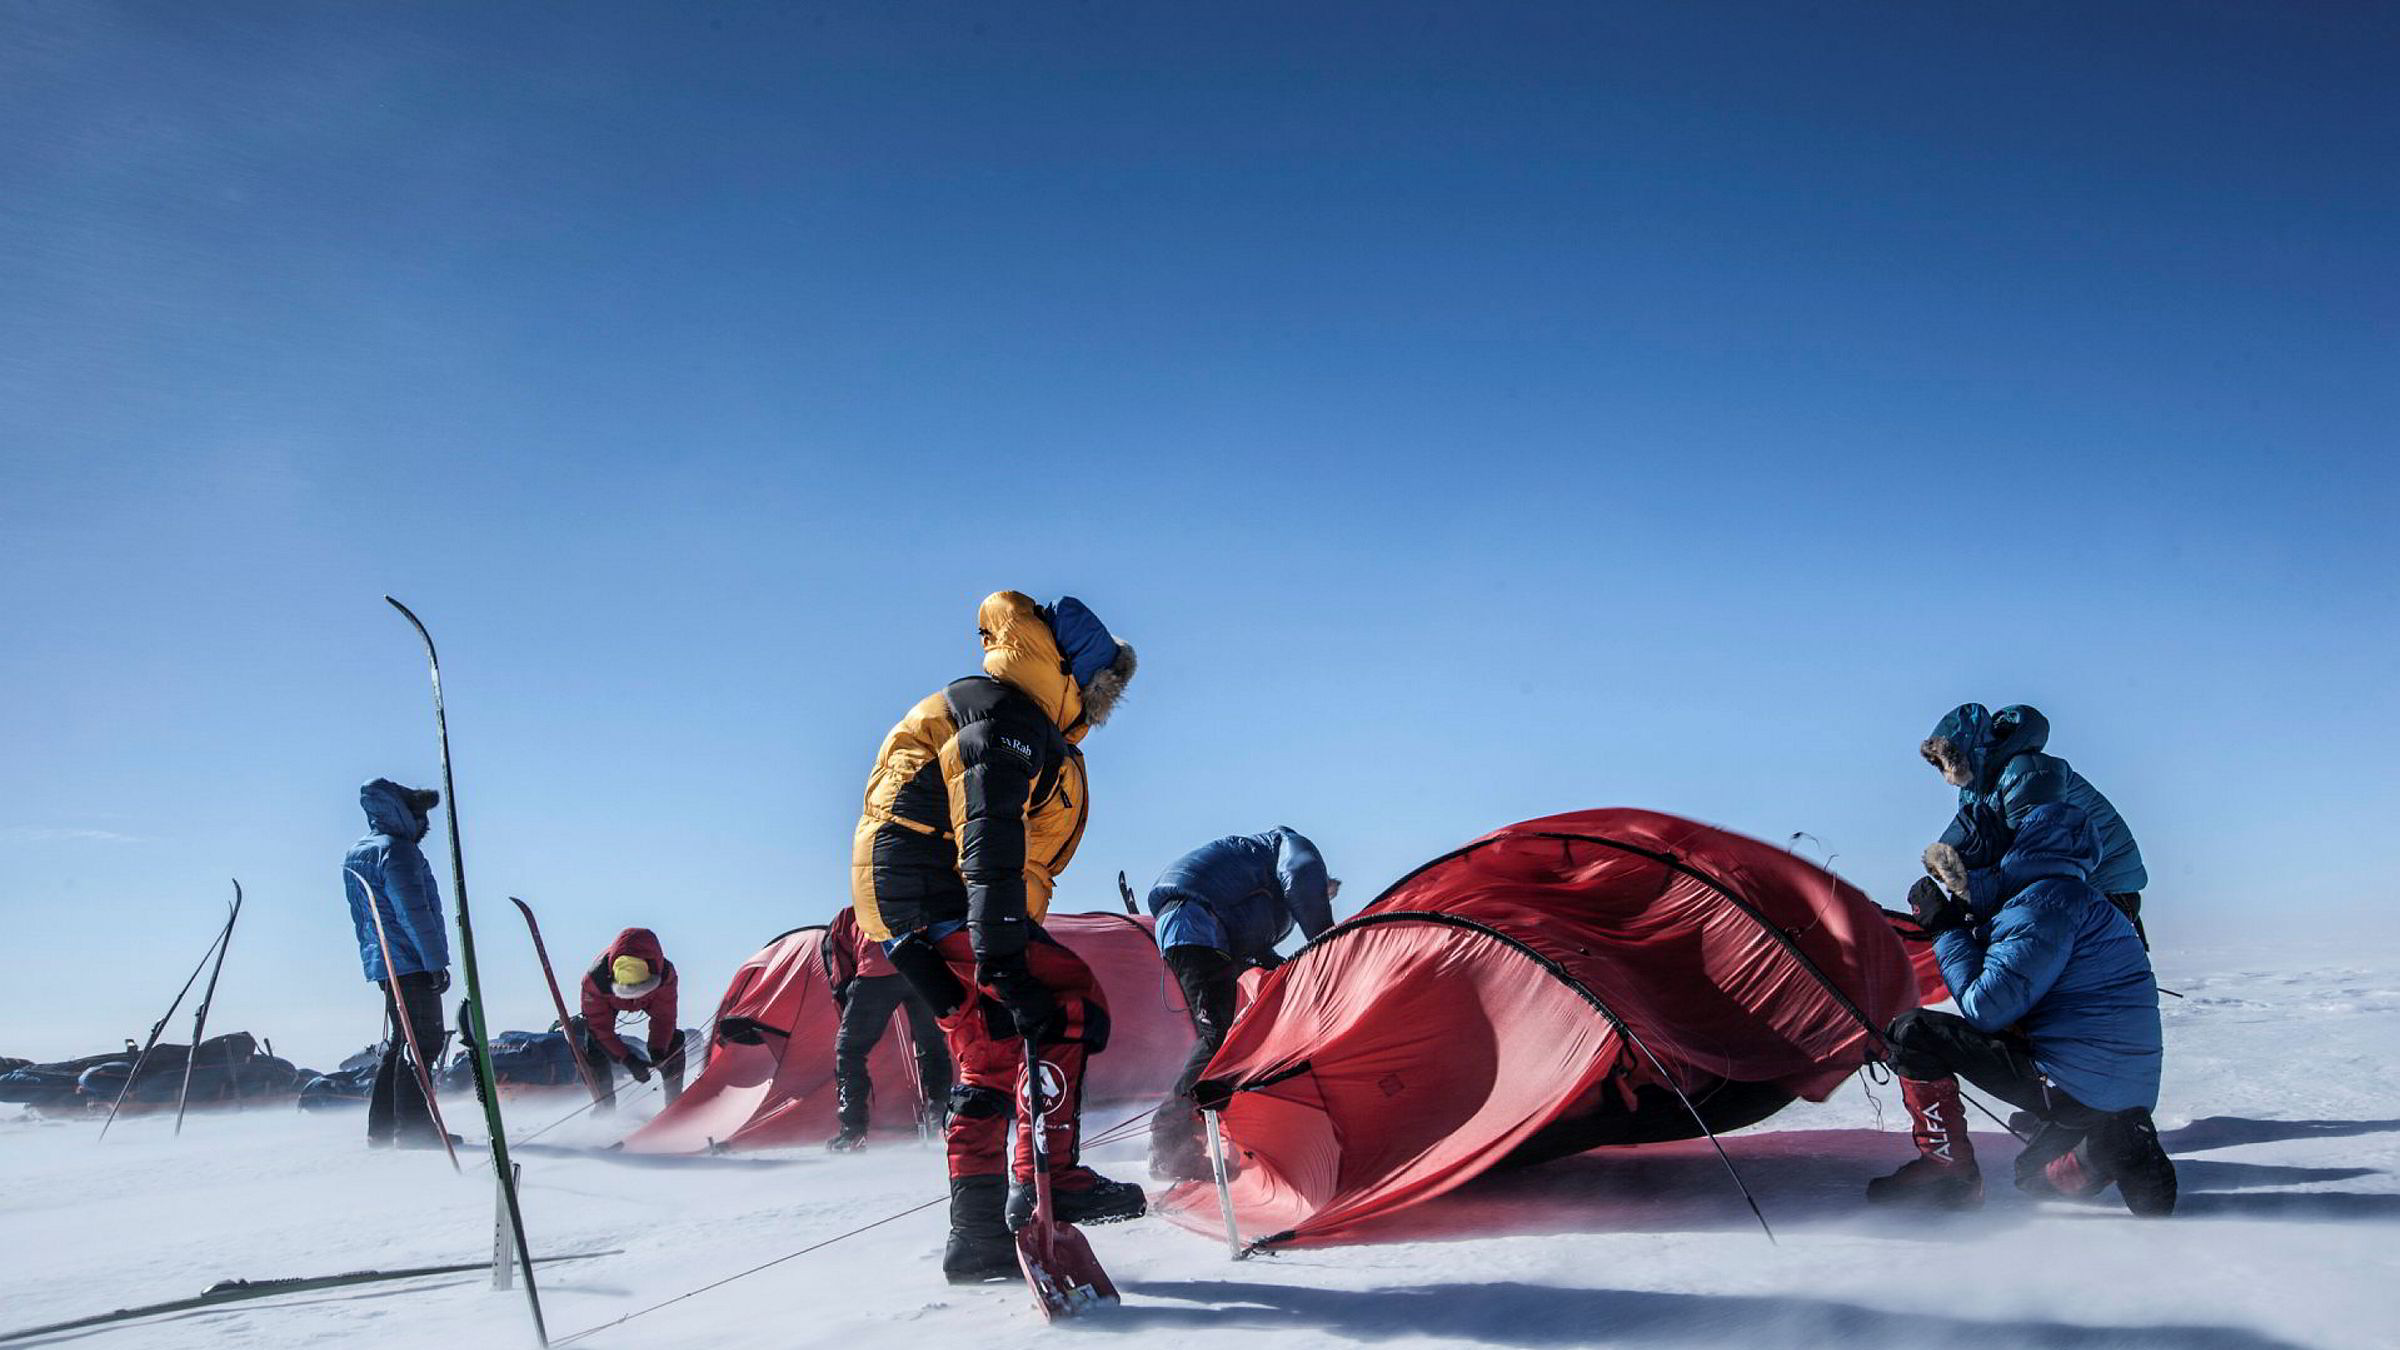 Grønlandskryssing med ski og pulk Hvitserk